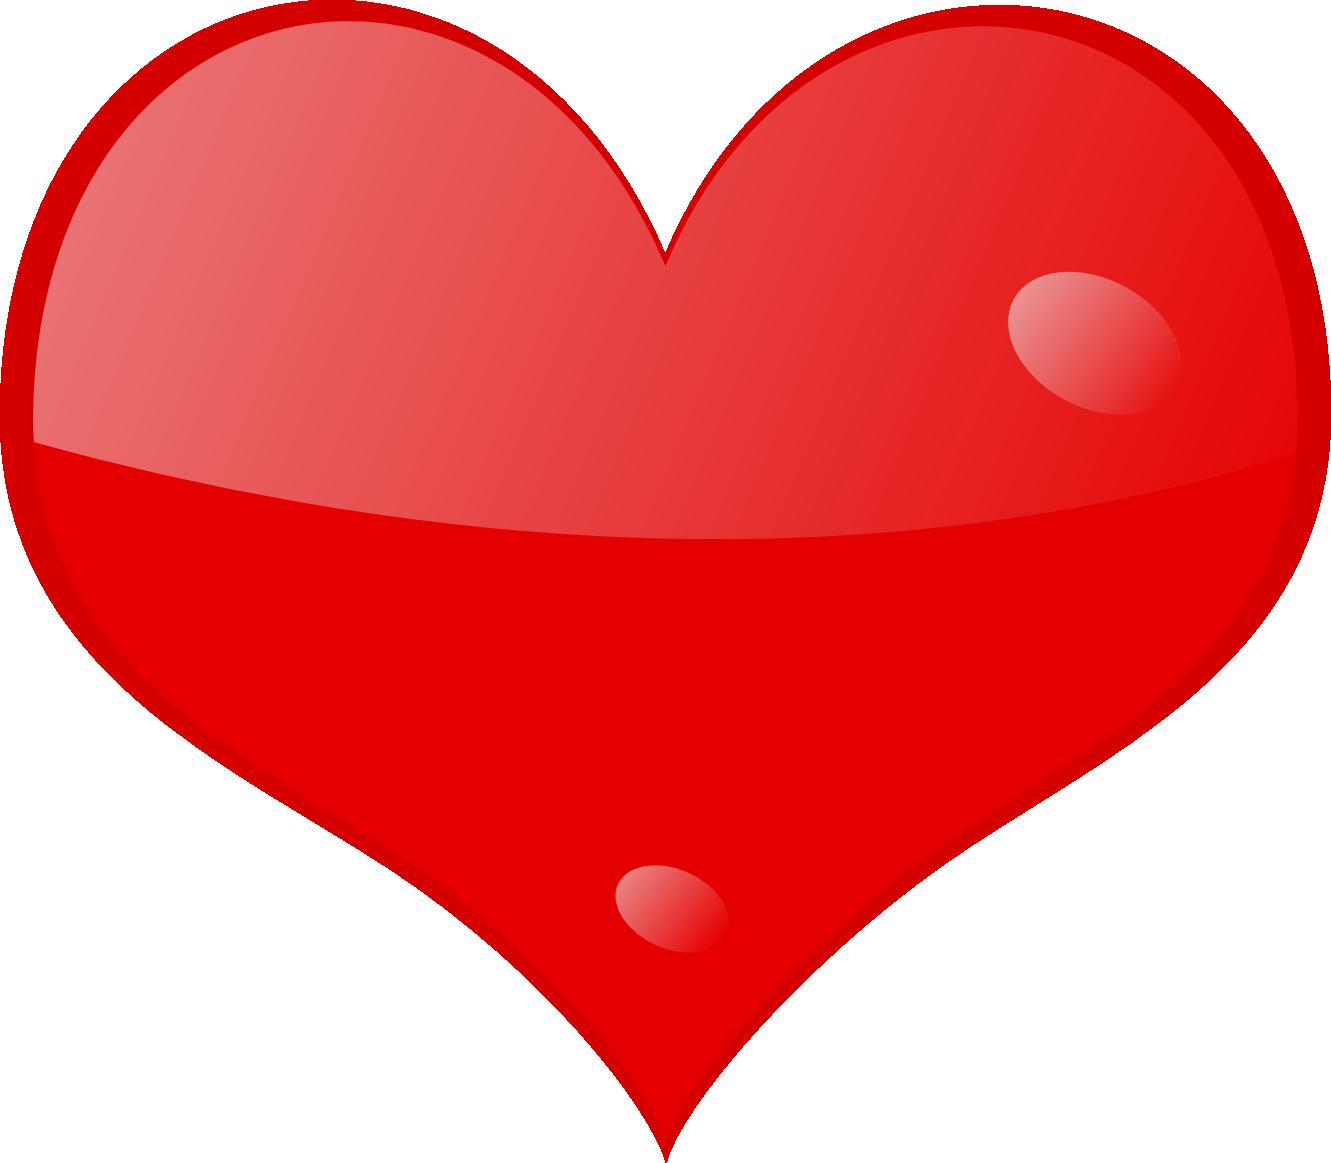 Heart Png Transparent